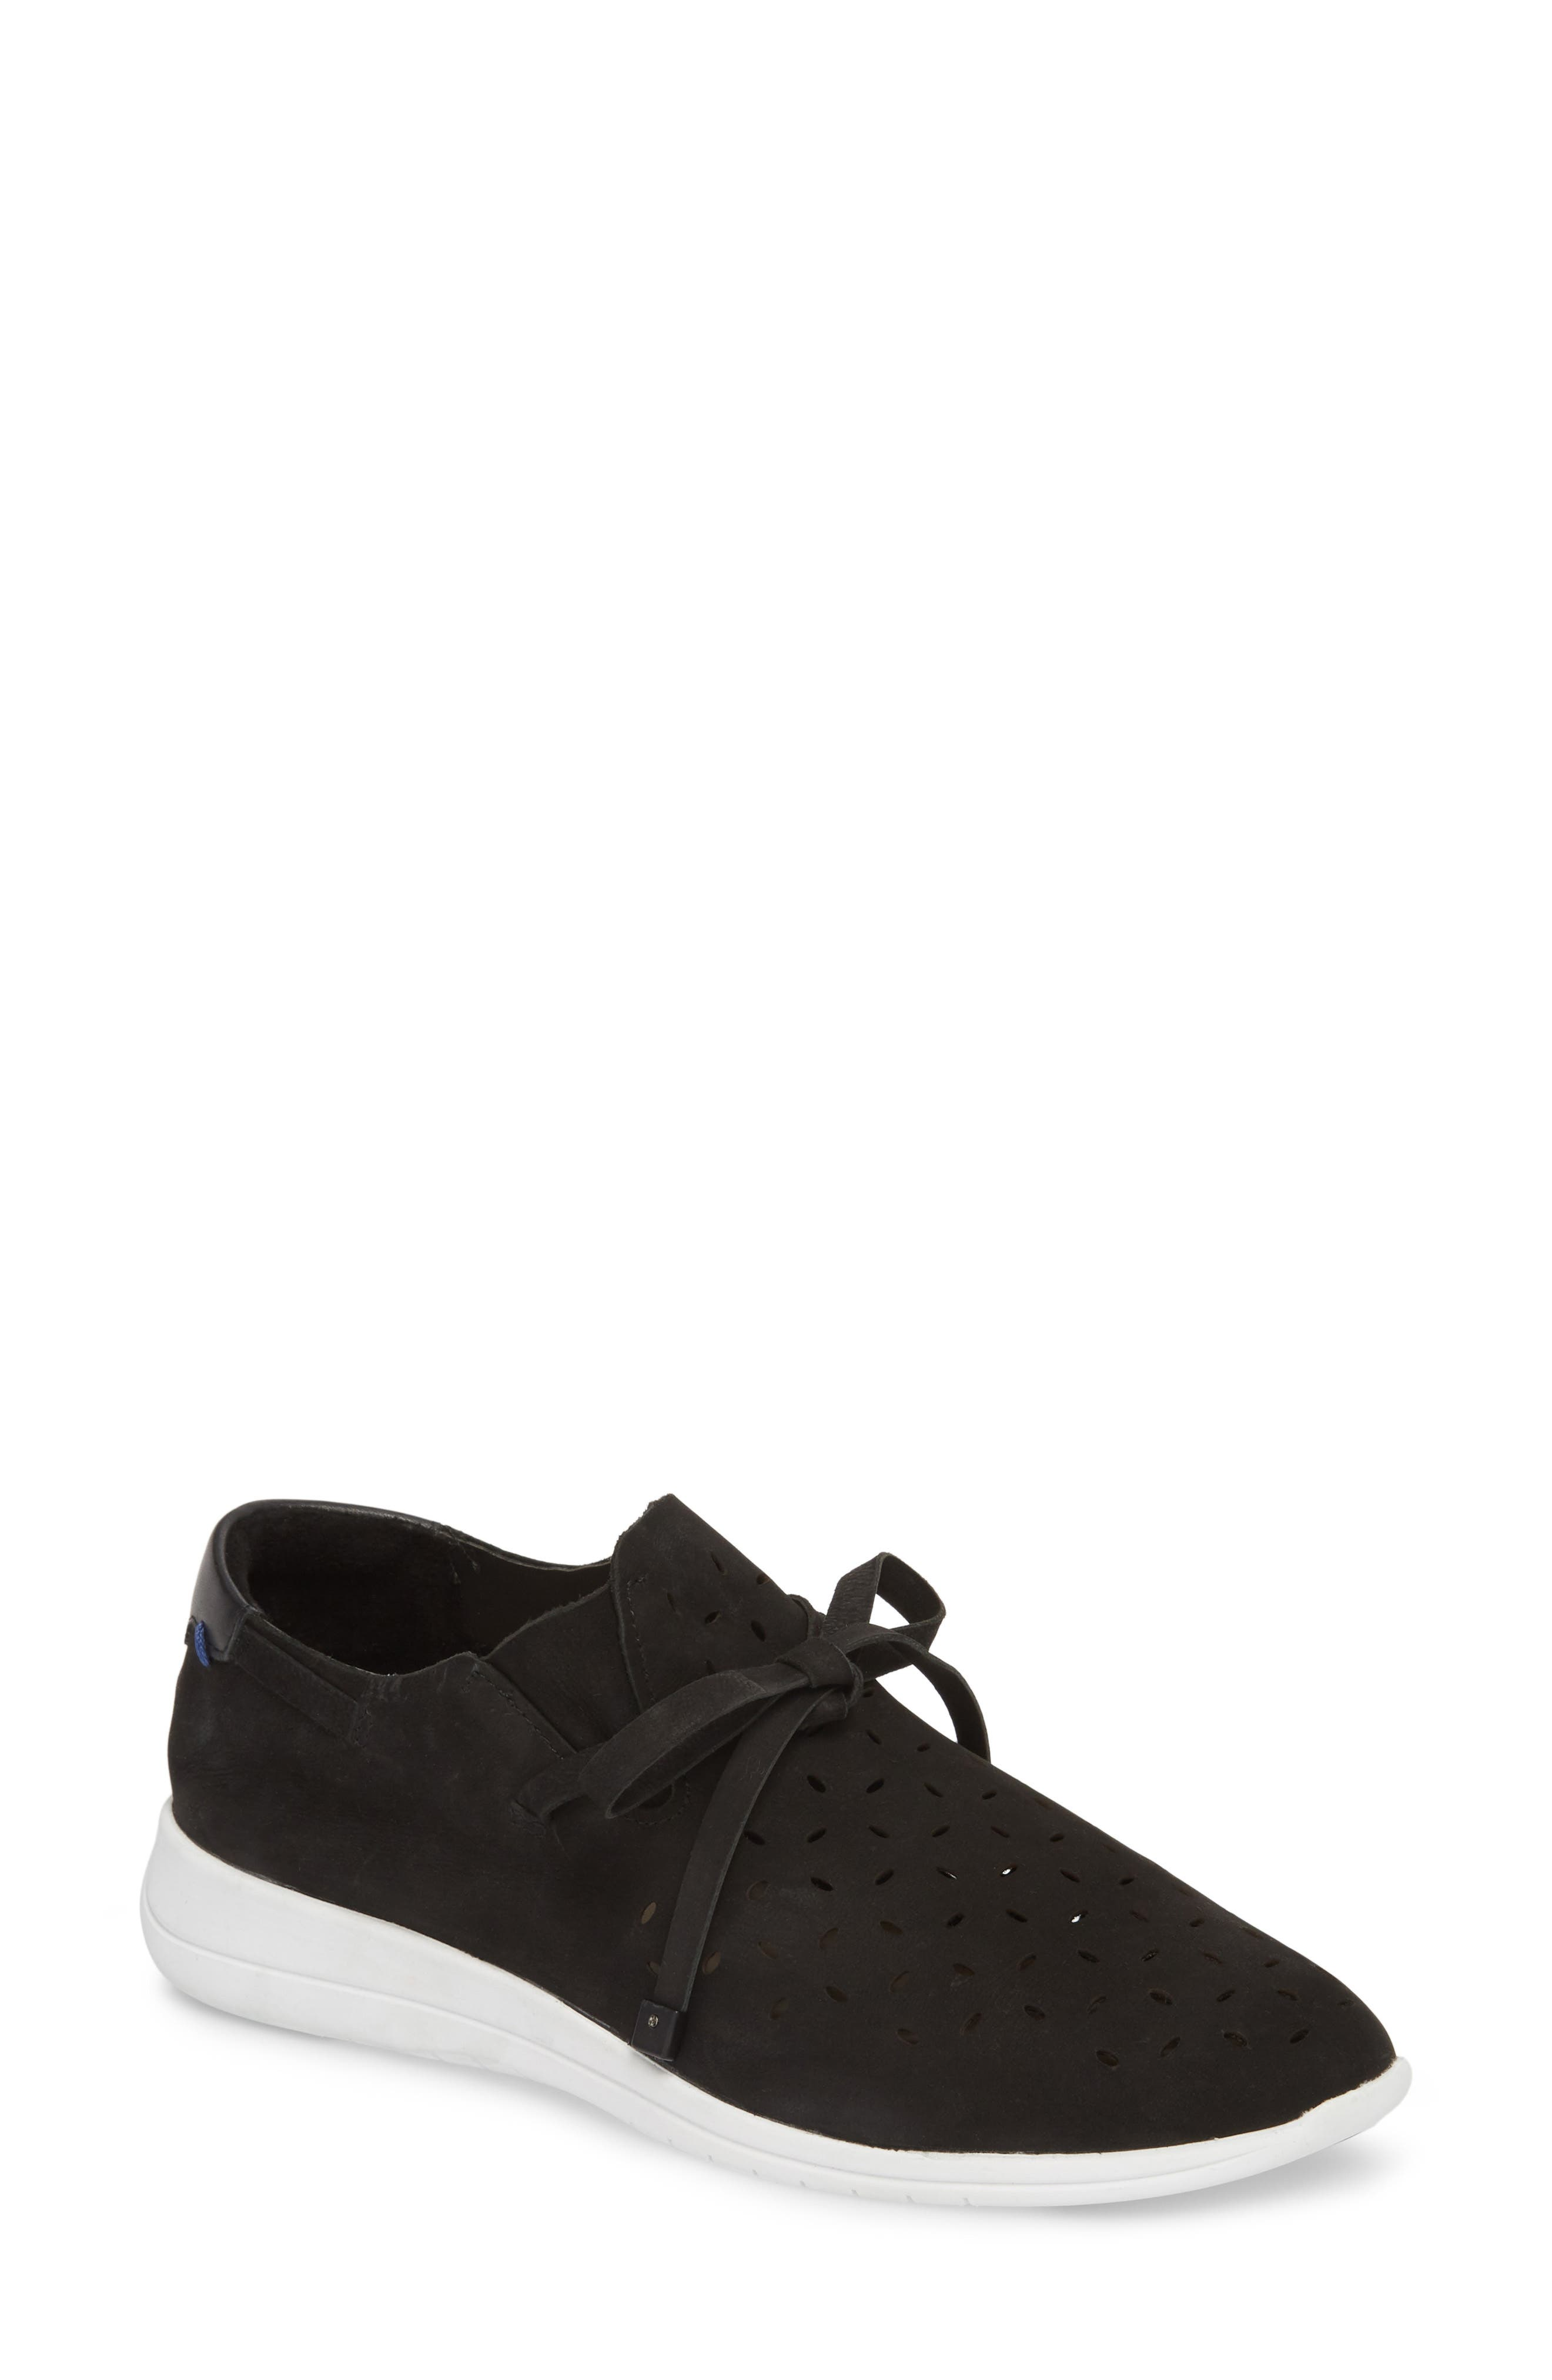 Freeport Sneaker,                         Main,                         color, Black Nubuck